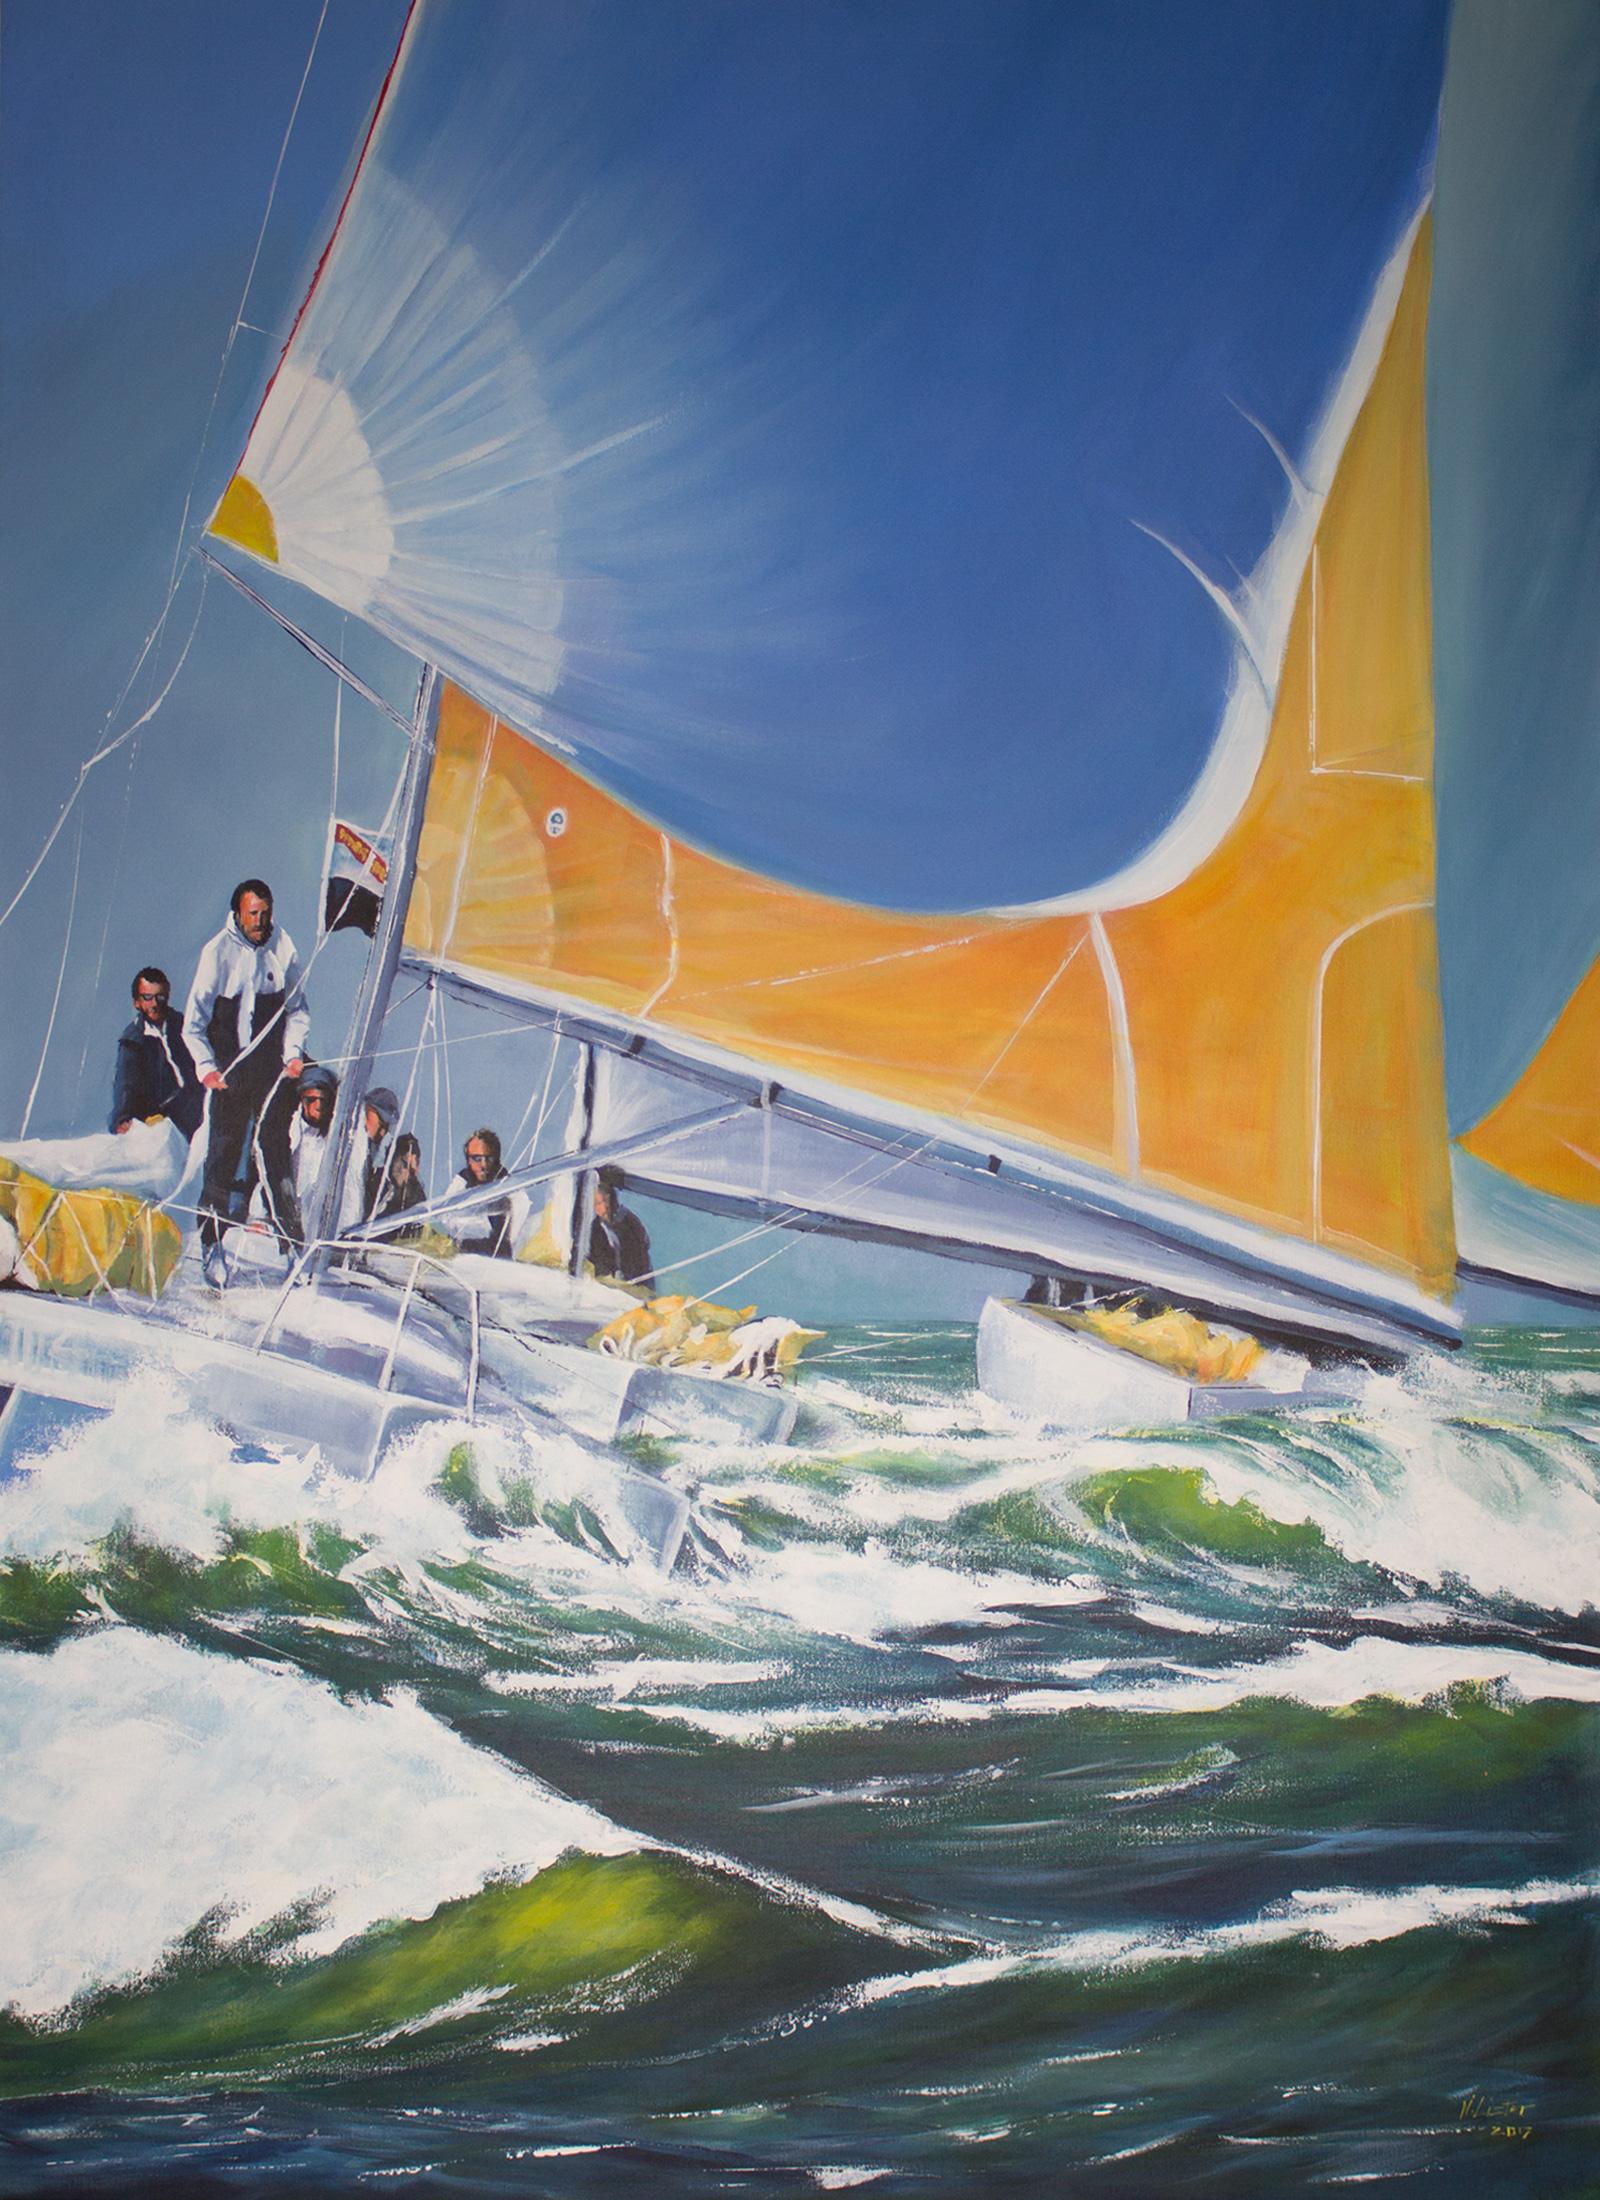 Ocean-Race-110x80